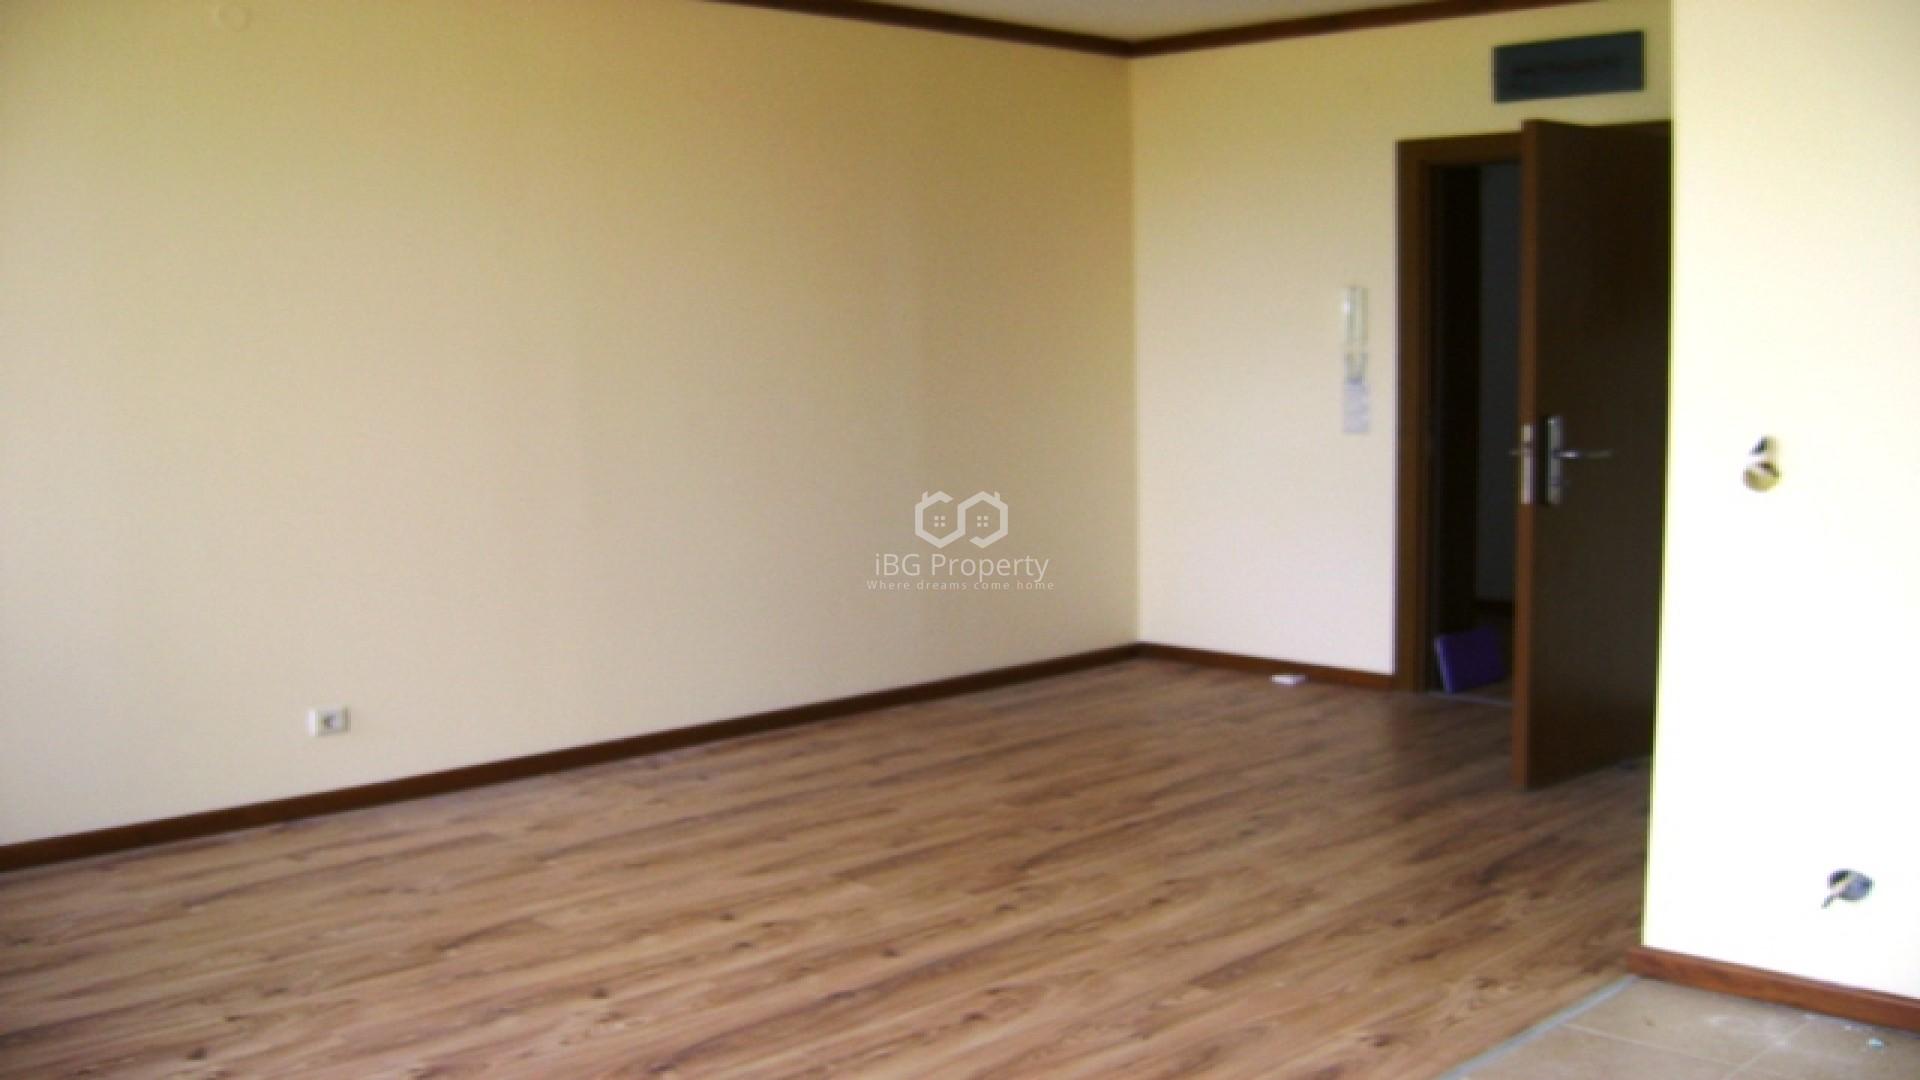 Однокомнатная квартира Банско 42 m2